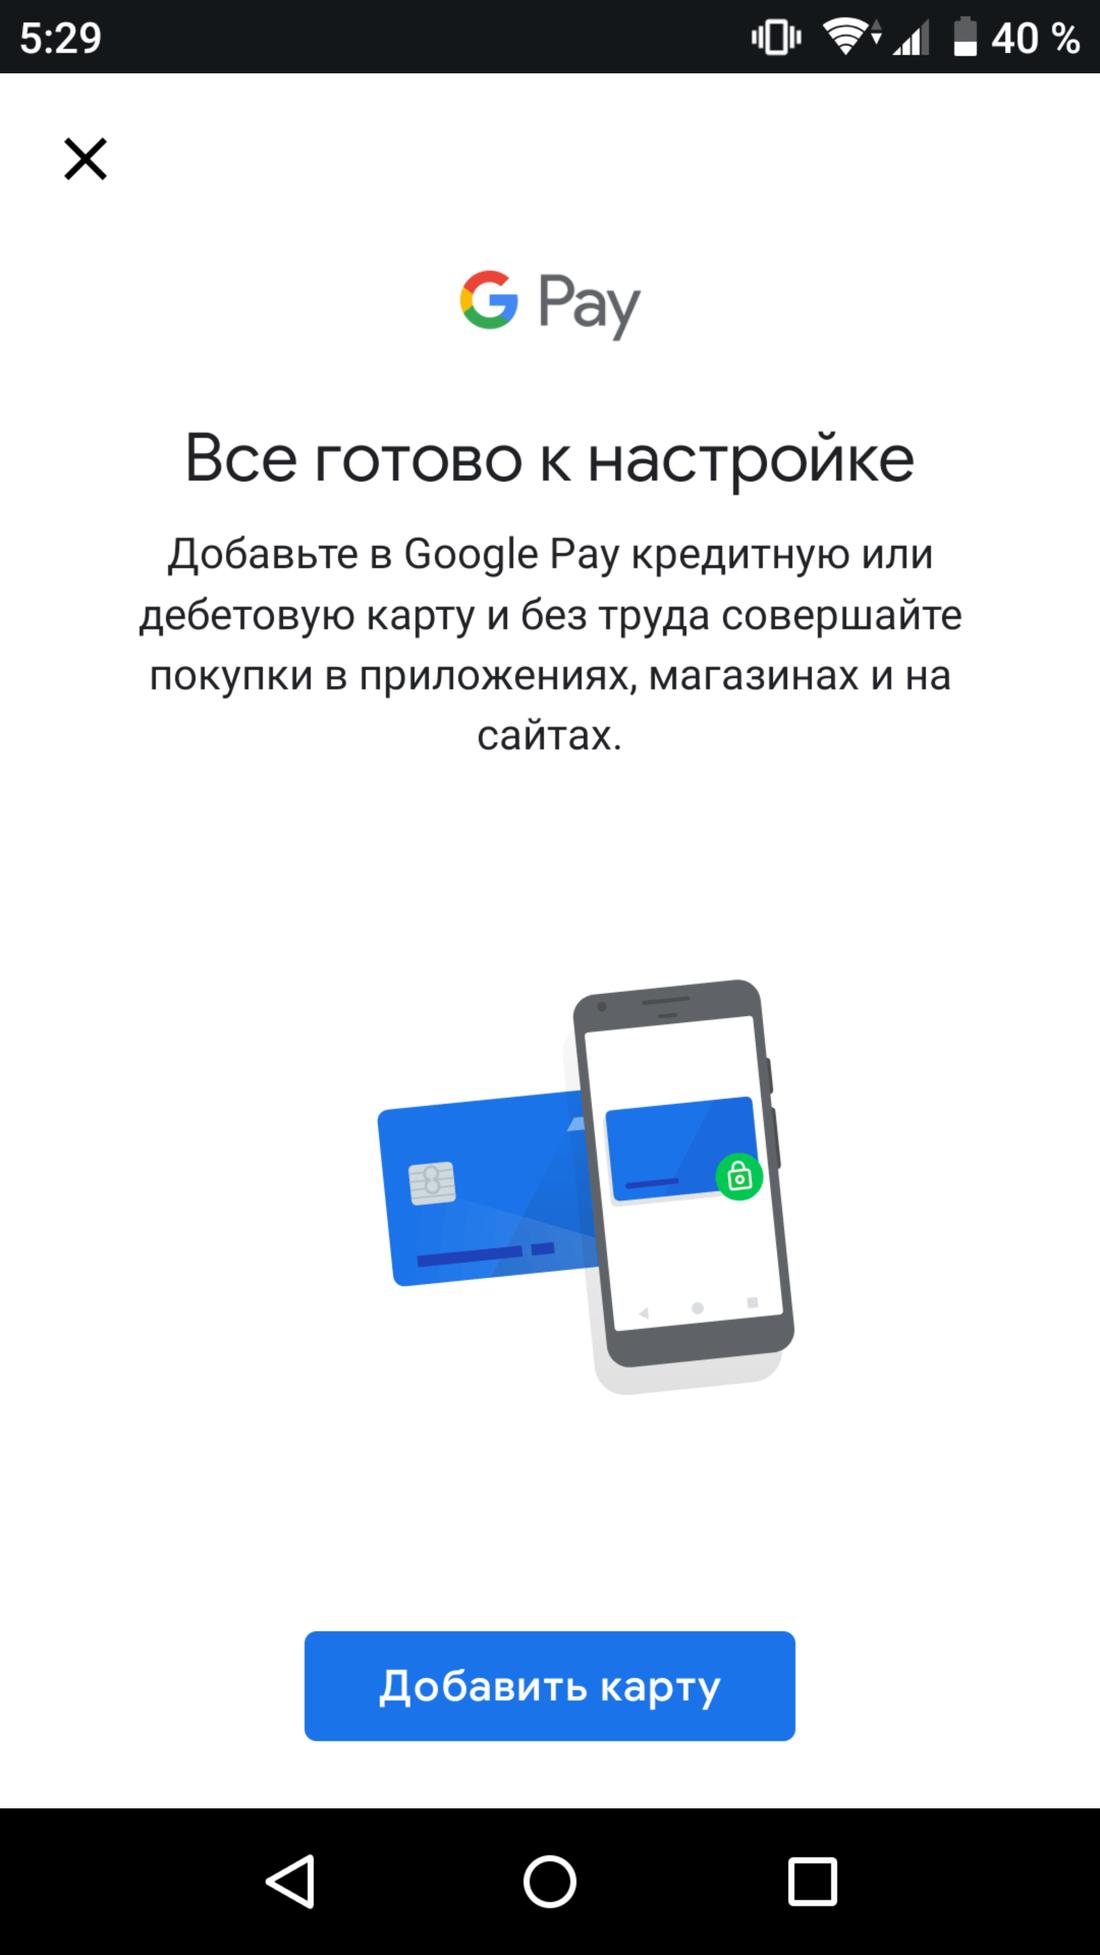 Скриншот #3 из программы Google Pay